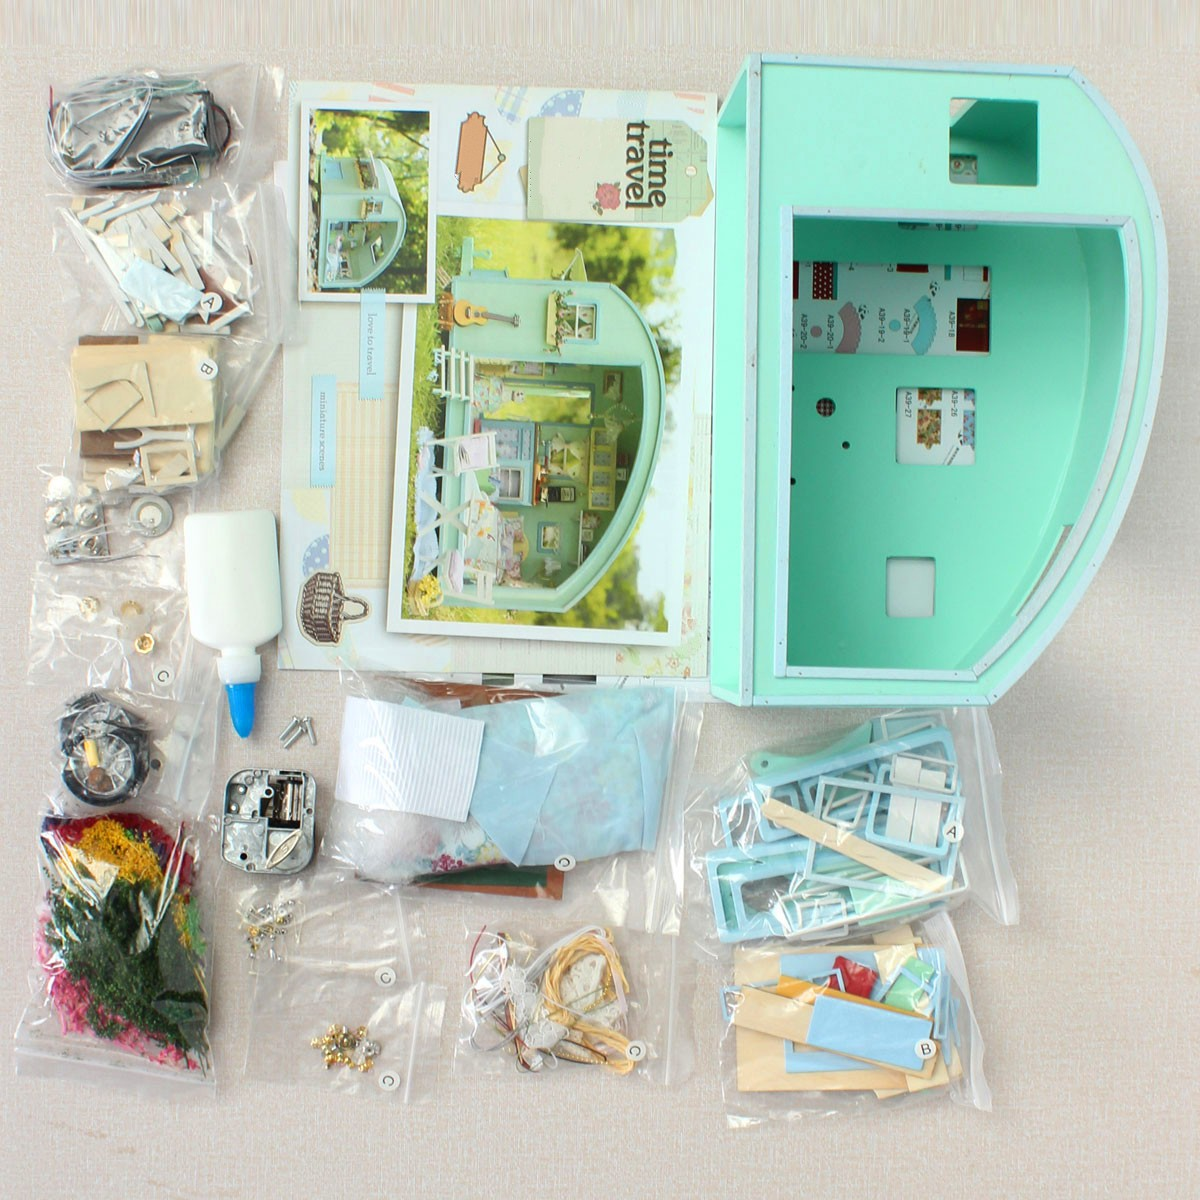 HTB15BQIN3HqK1RjSZJnq6zNLpXav - Robotime - DIY Models, DIY Miniature Houses, 3d Wooden Puzzle